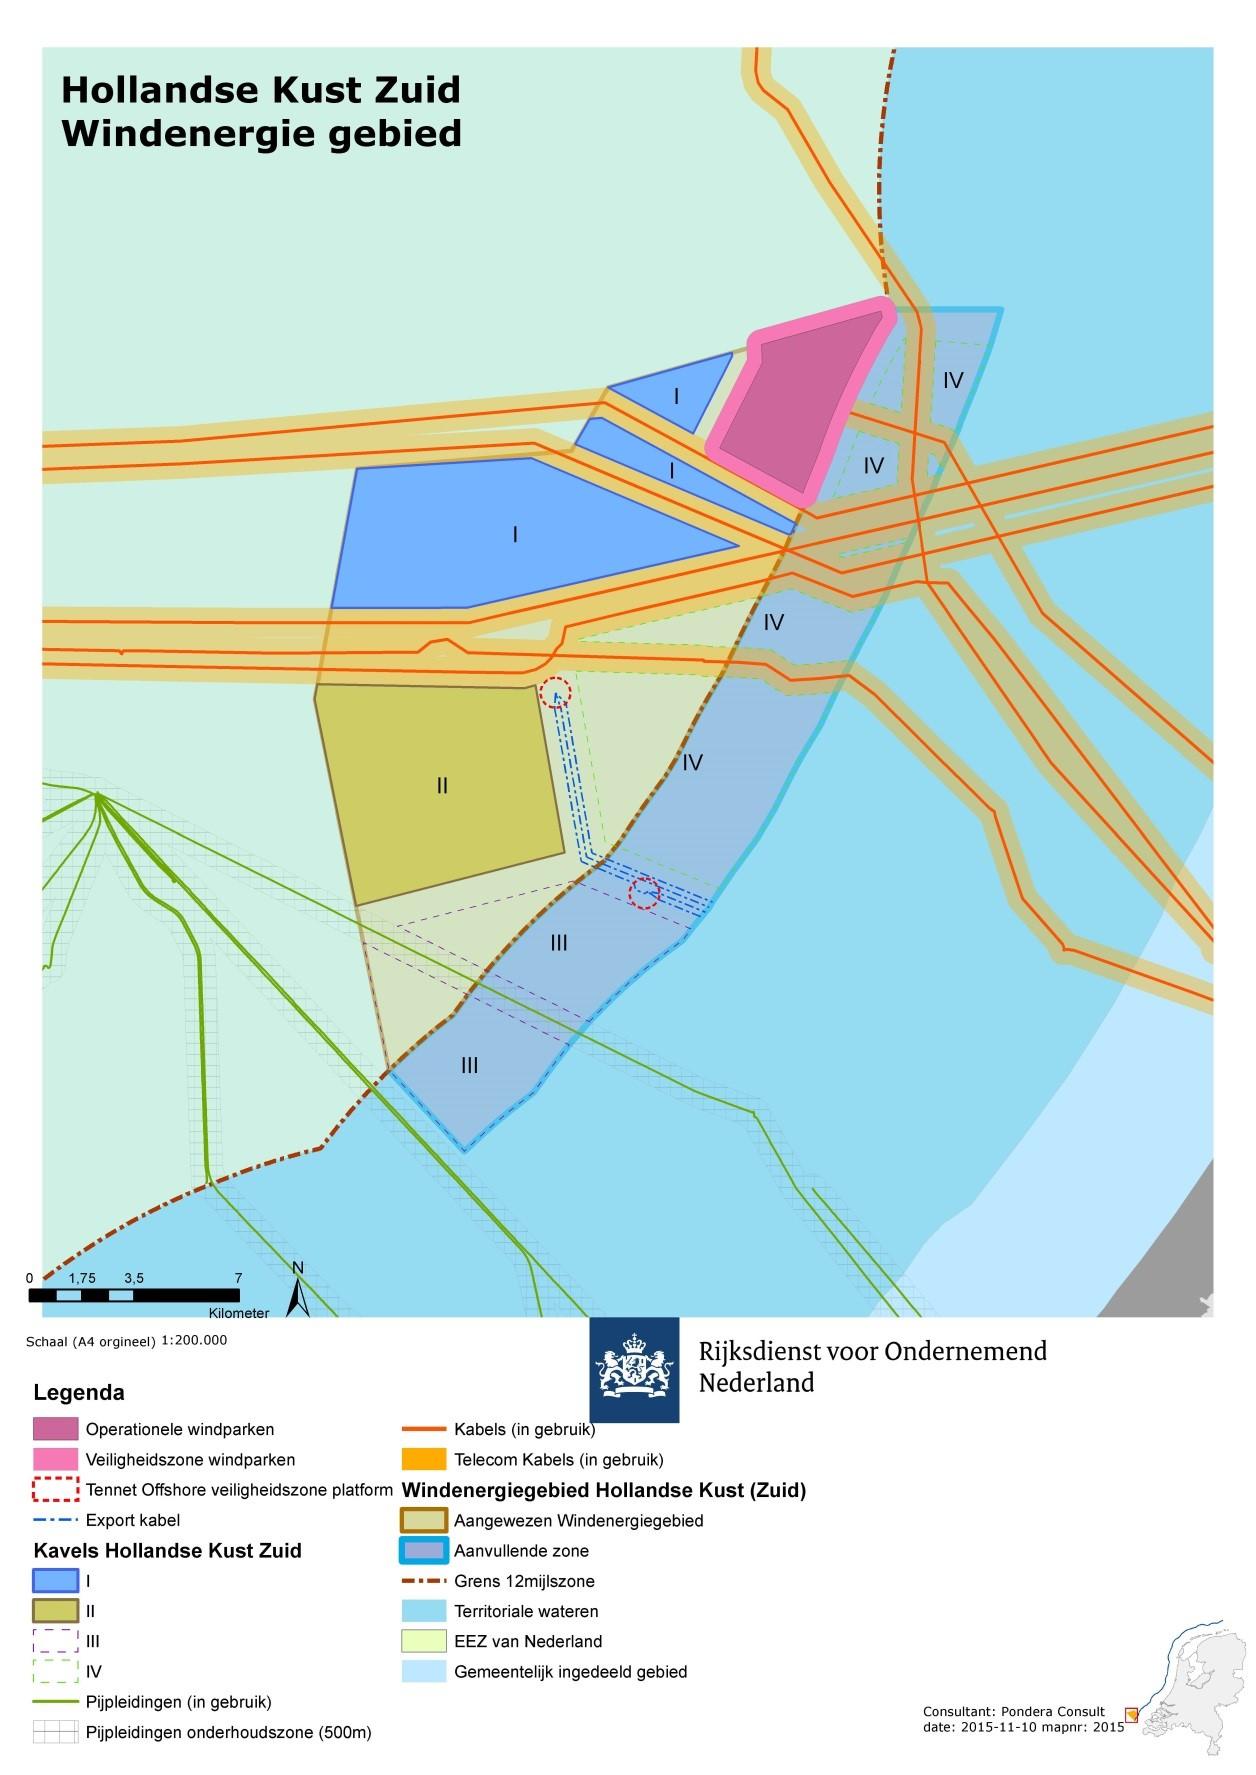 Voorgestelde verkaveling windenergiegebied Hollandse Kust (zuid)